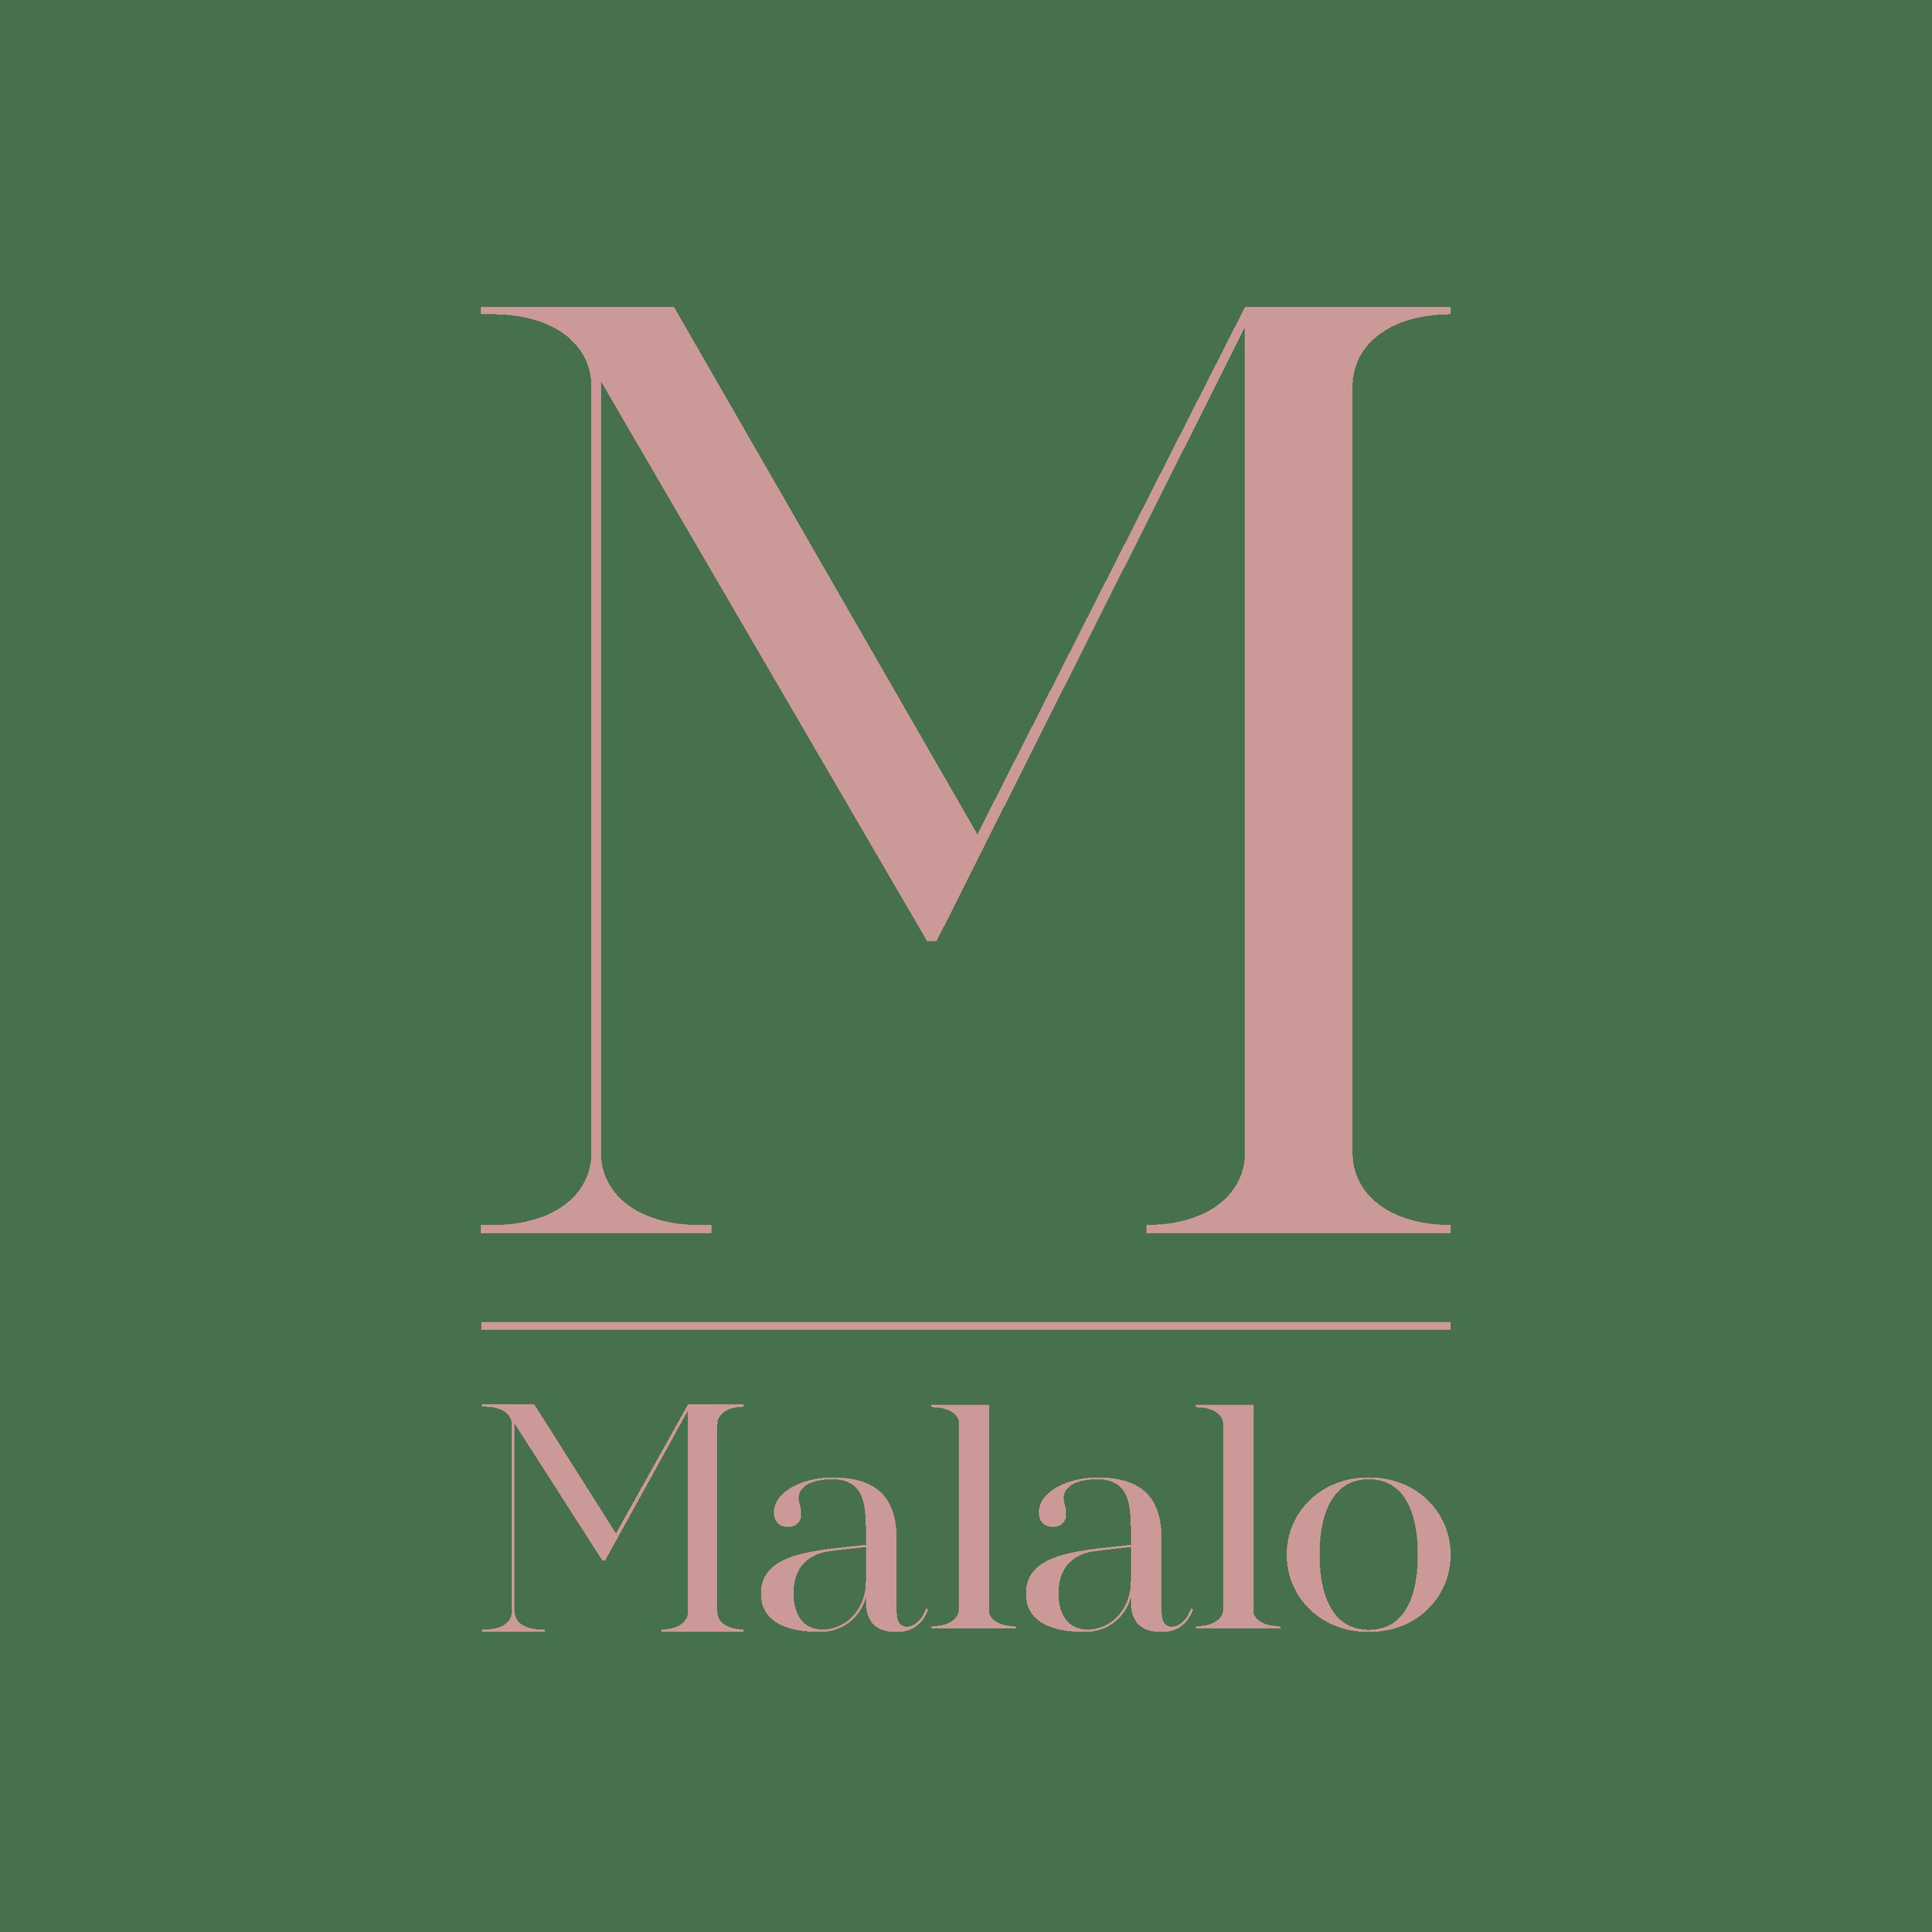 Malalo